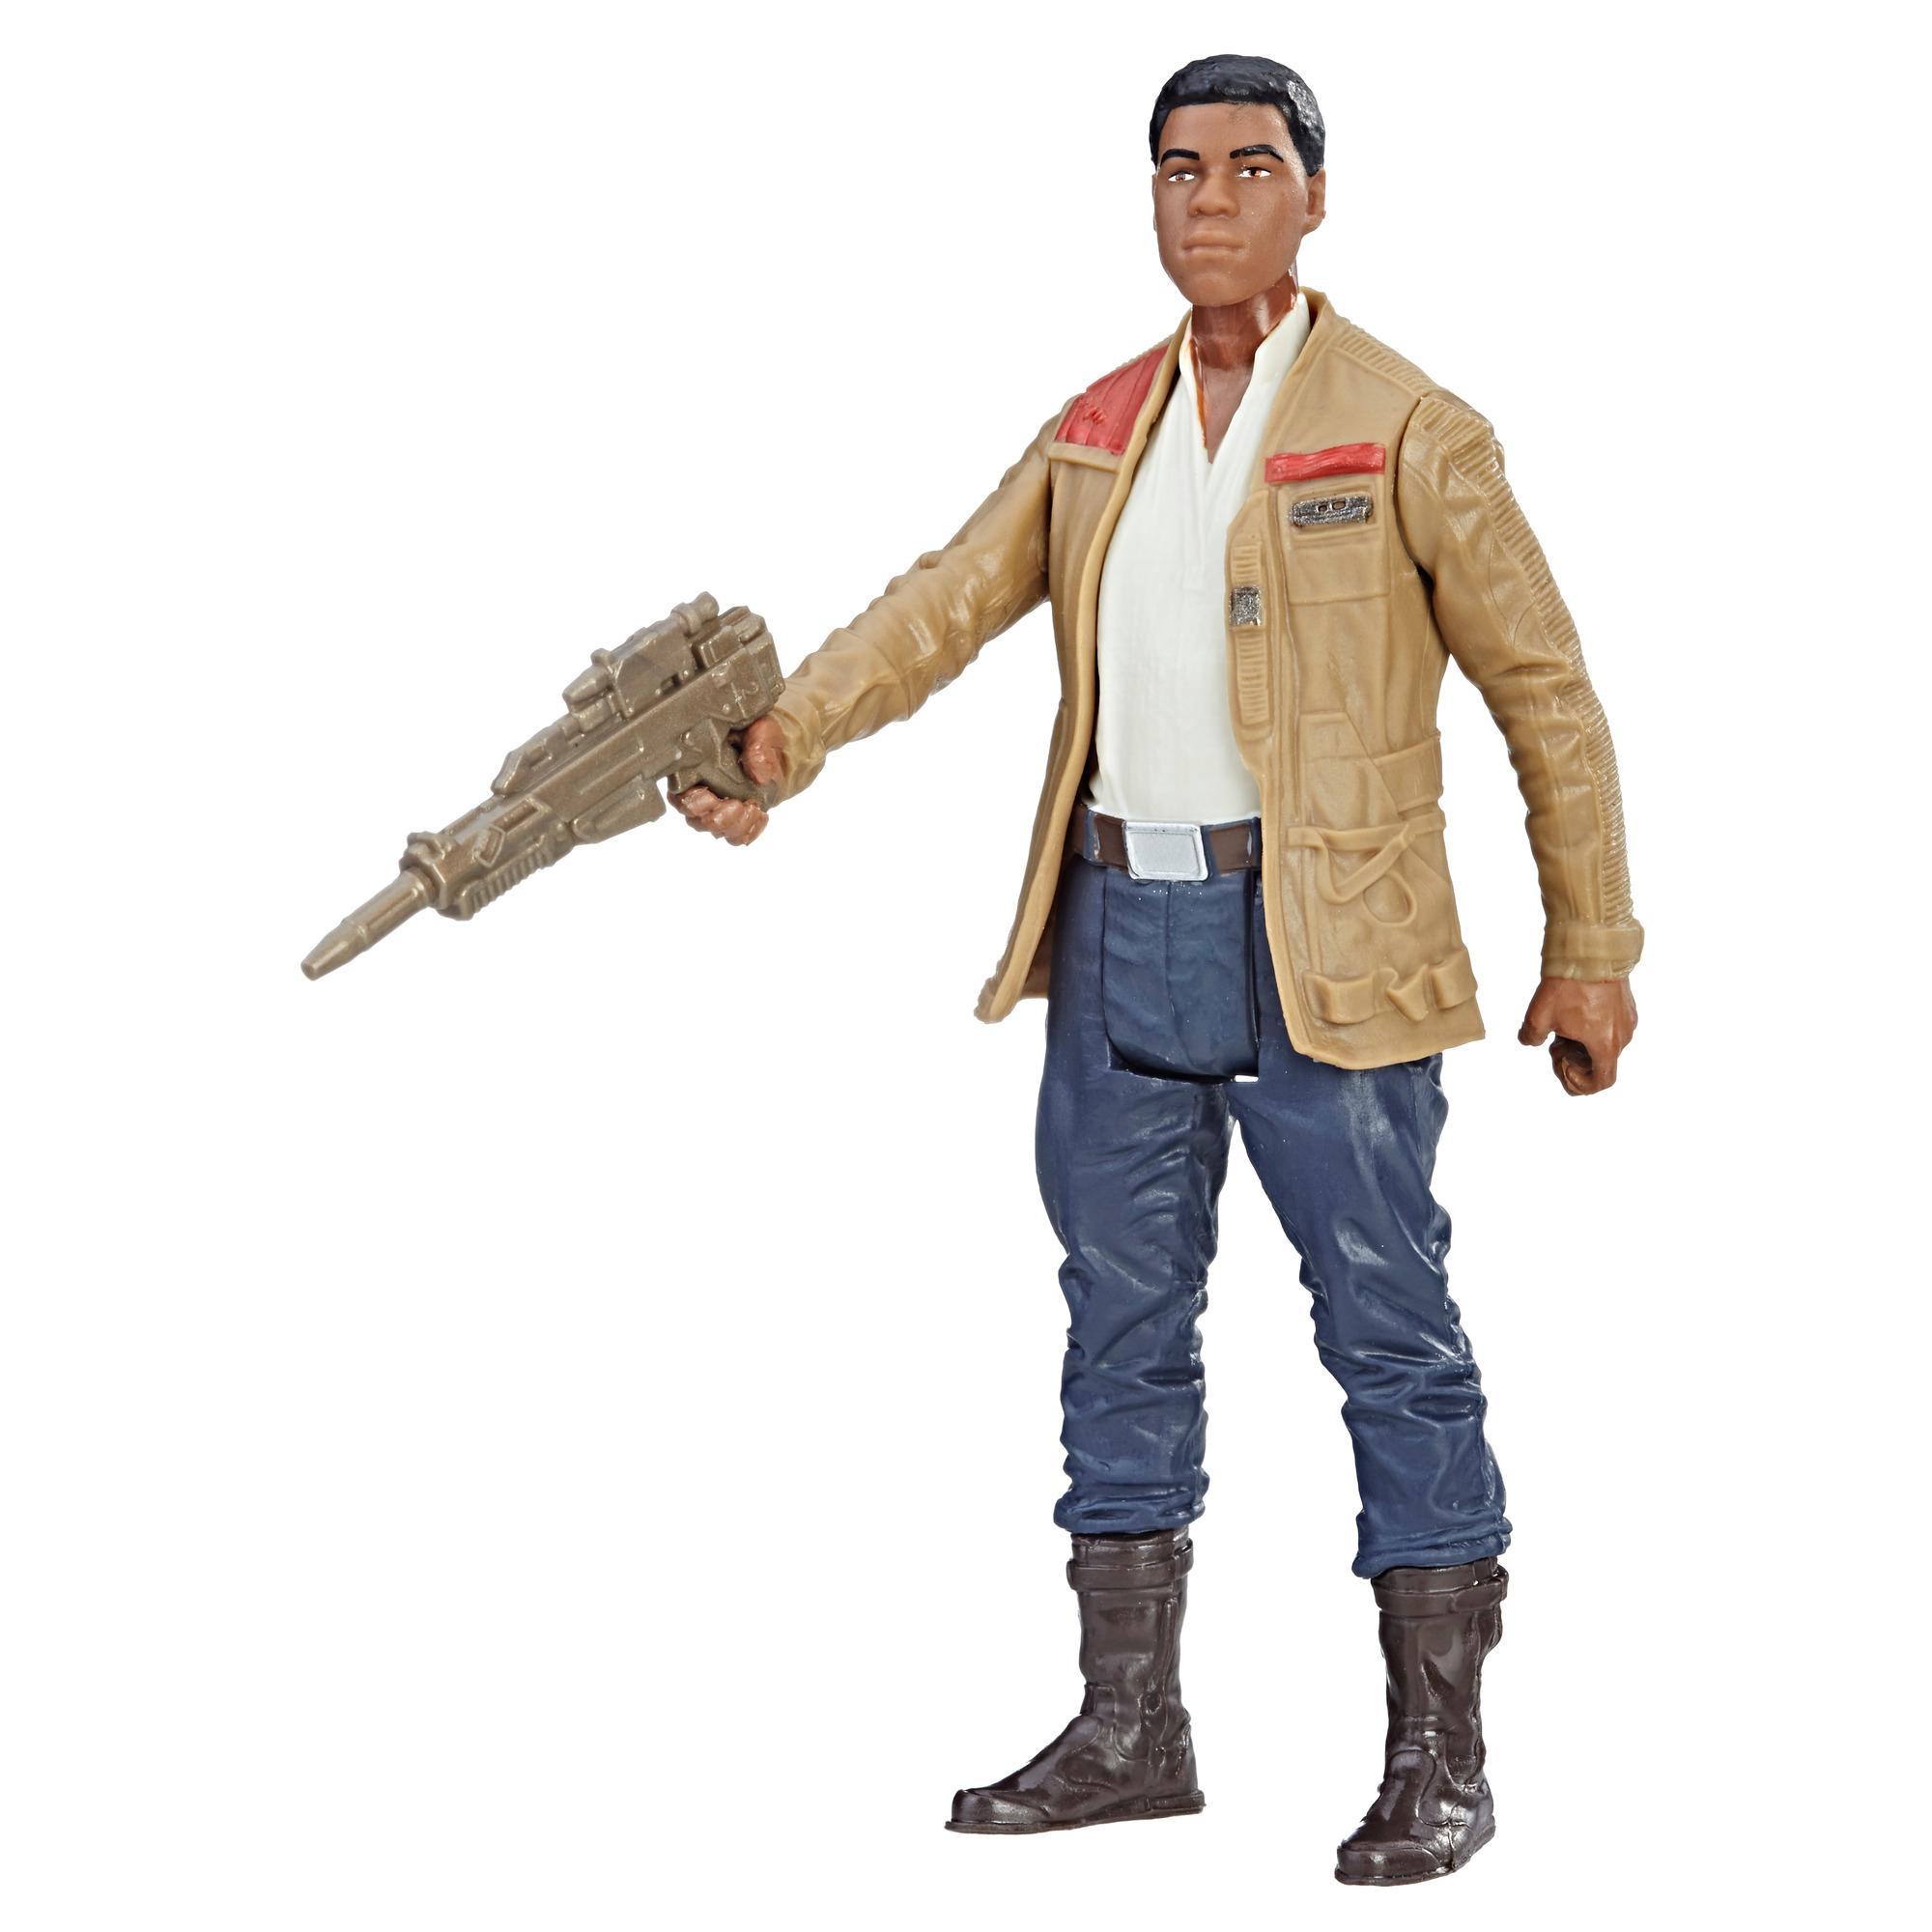 Figura Force Link Star Wars Finn (Combatente da Resistência)